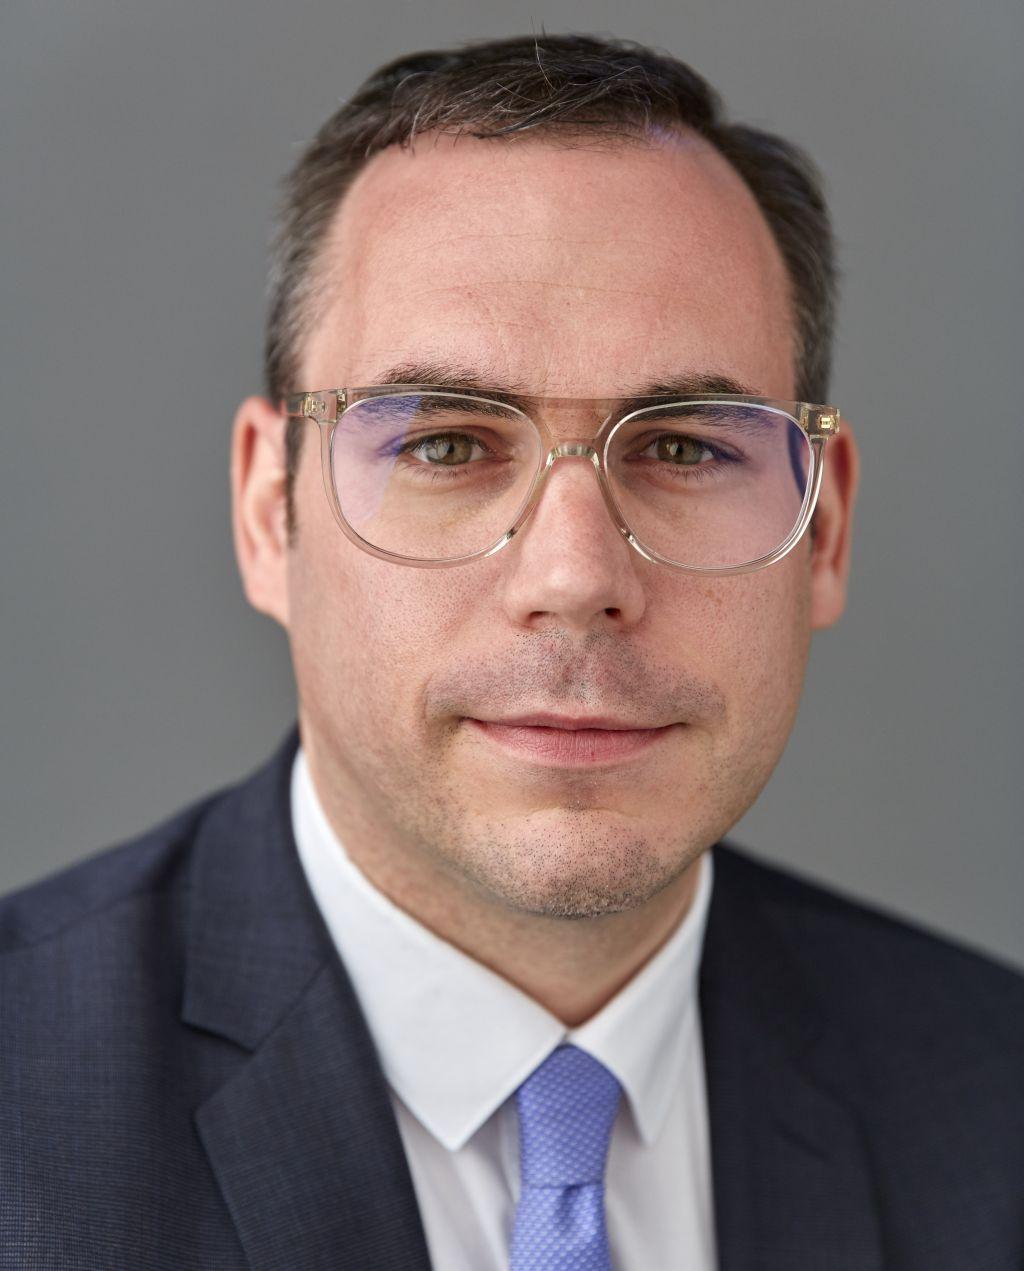 Bürgermeister Graben Neudorf